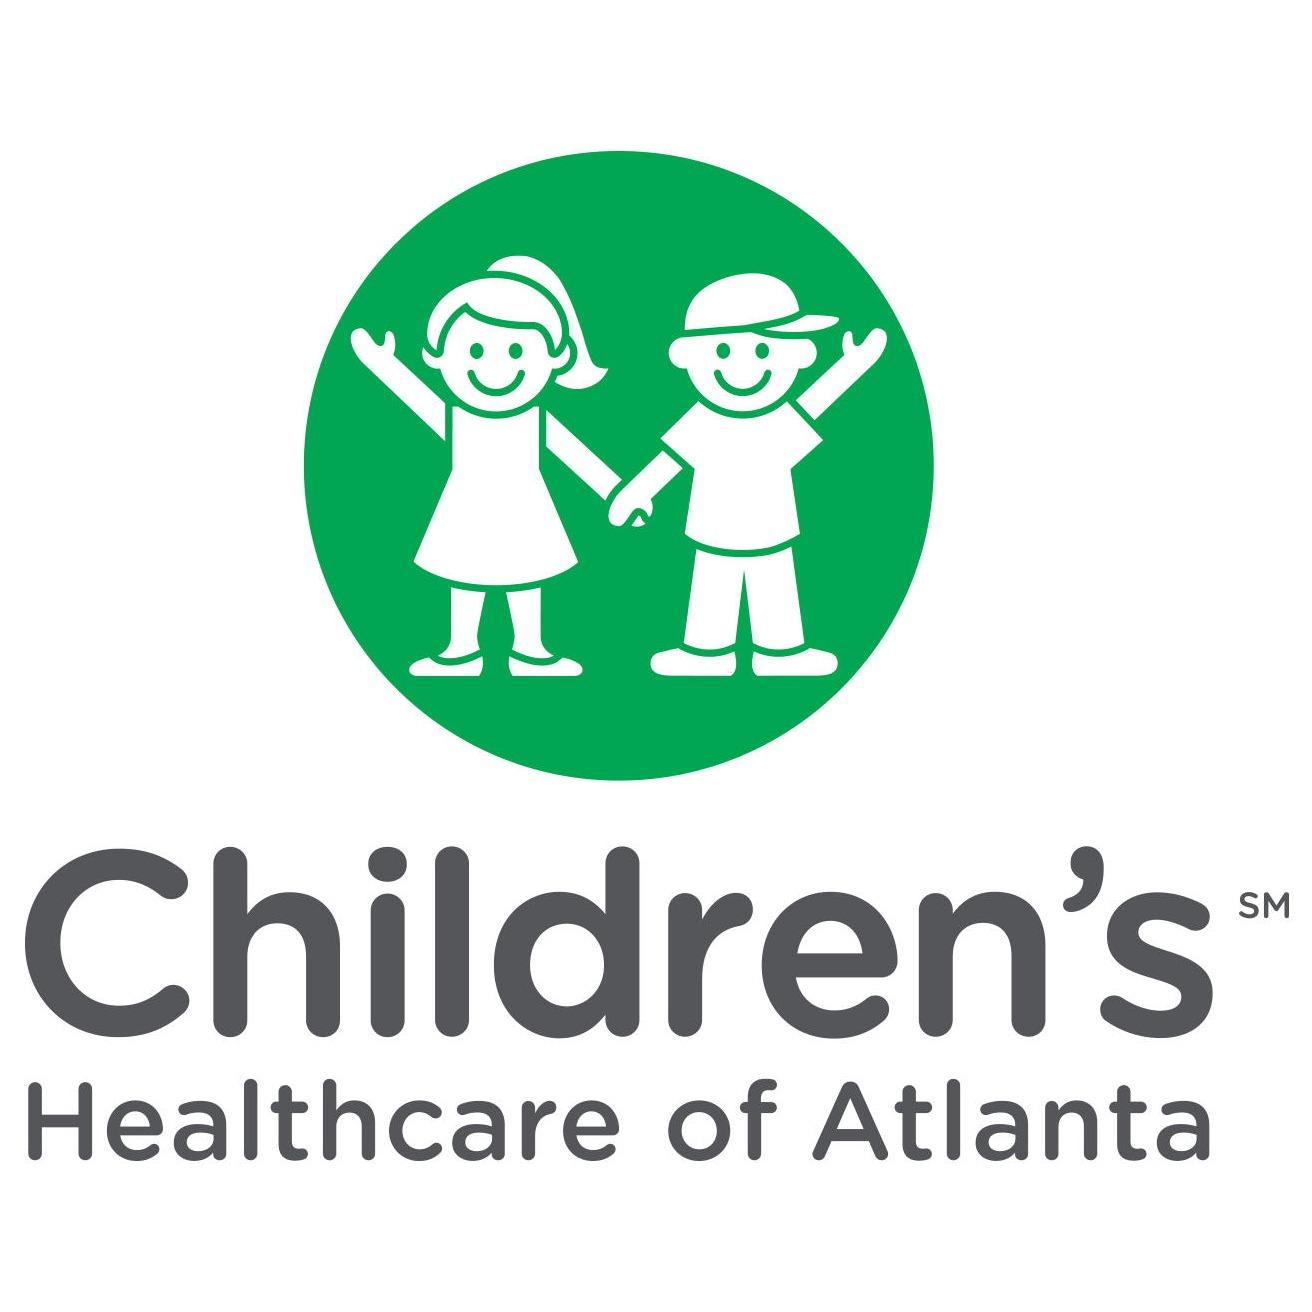 Children's Healthcare of Atlanta - Scottish Rite Hospital